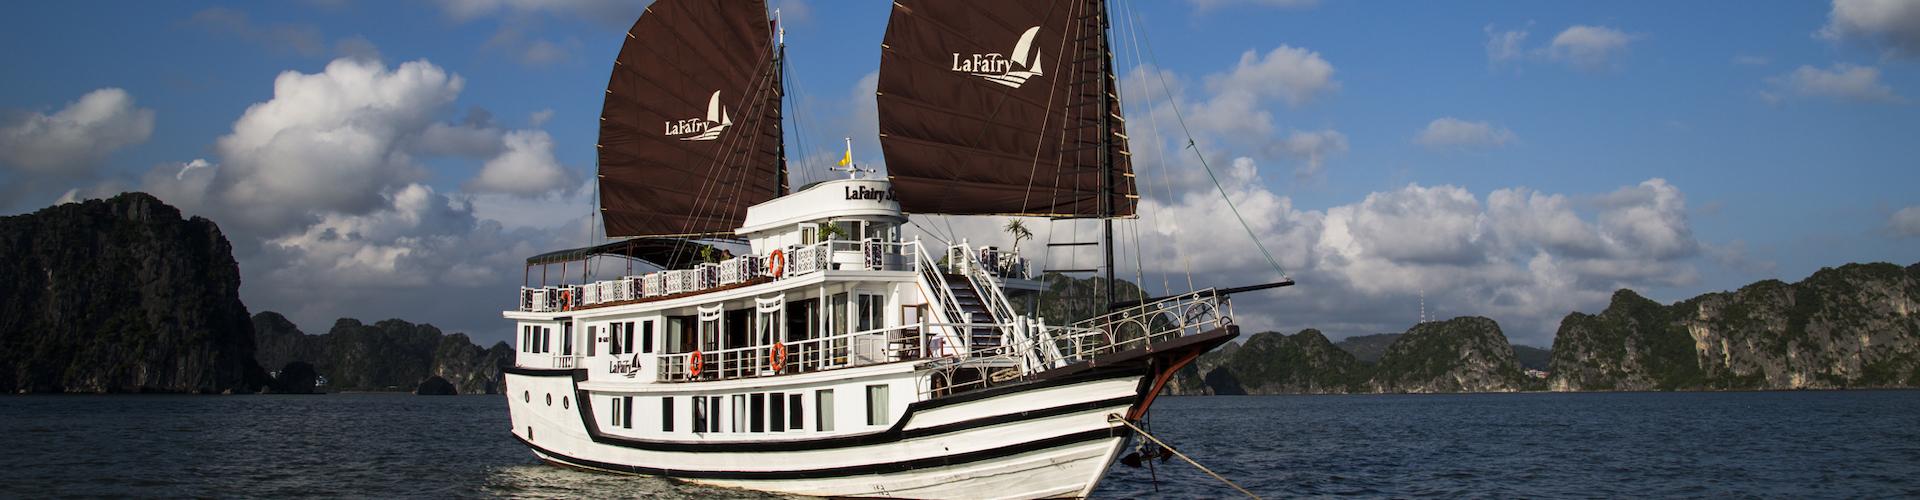 Fr-LaFairy Sails